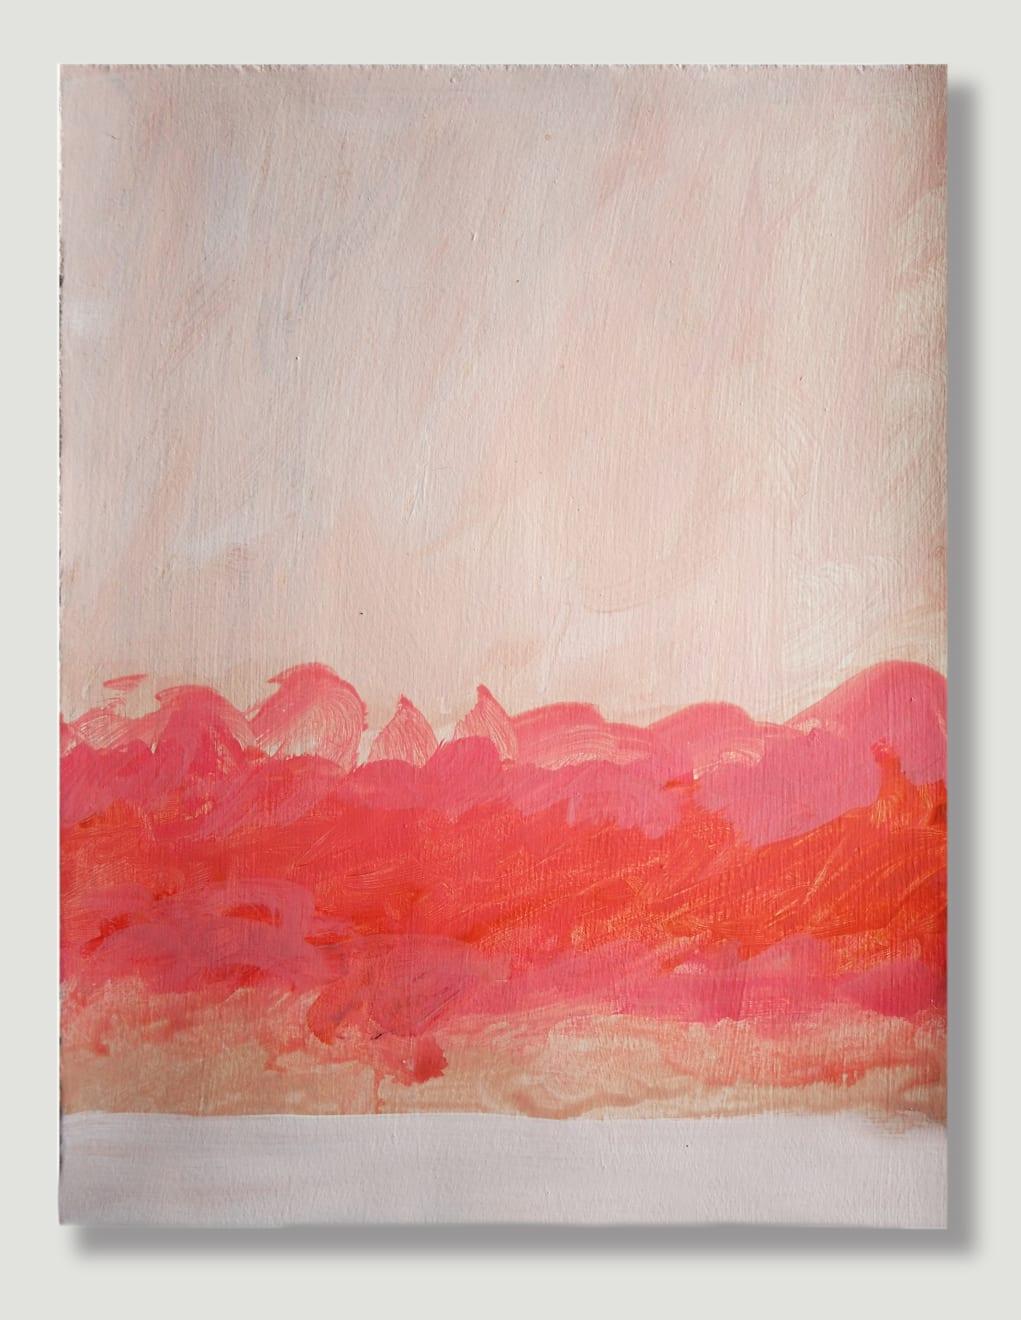 Caroline Popham, Untitled Pink/Red, 2020